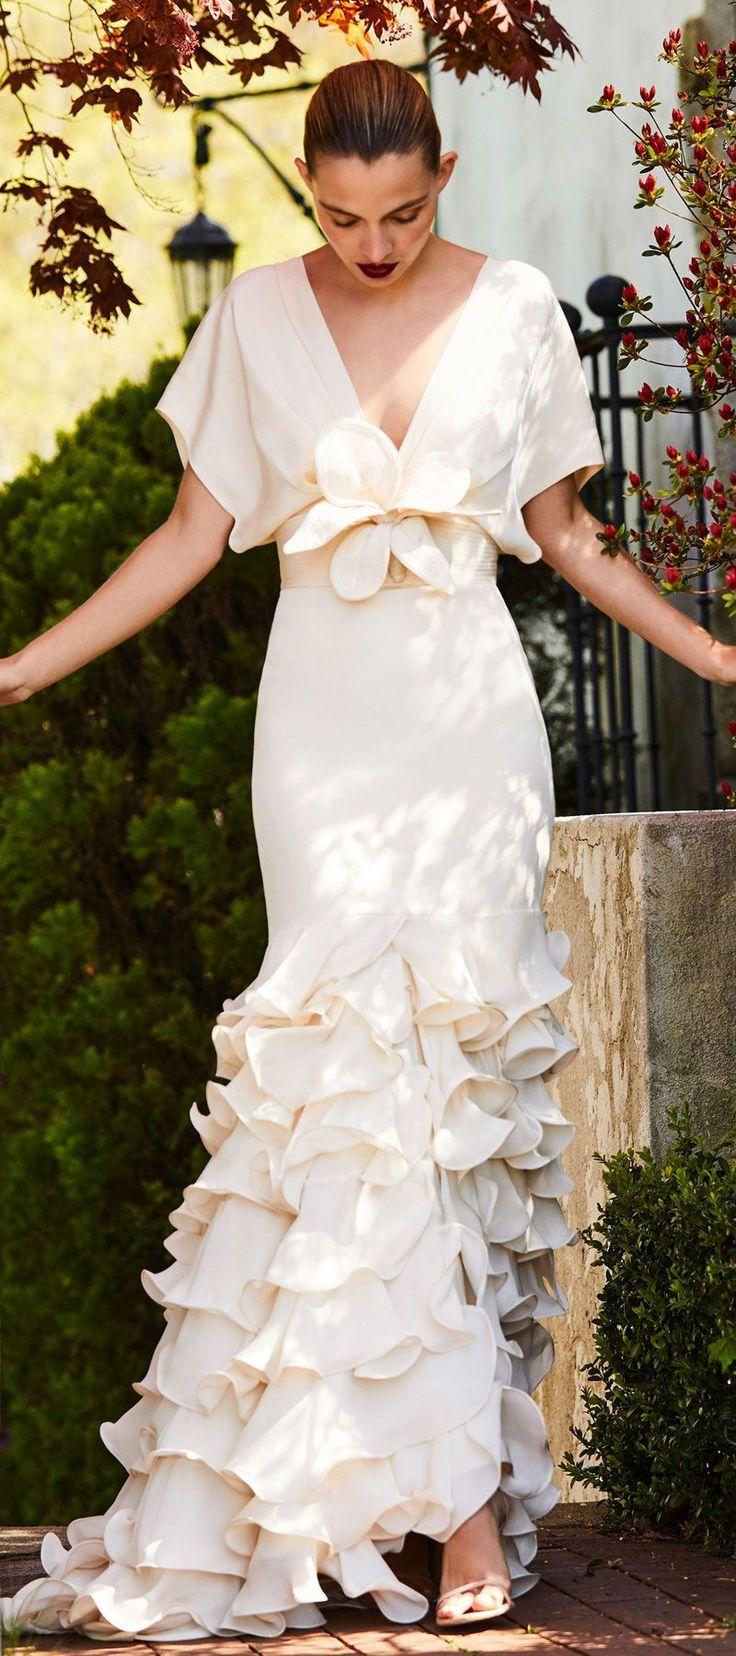 self tie flower belt, a plunging neckline short sleeves Tiered ruffle mermaid wedding dress #wedding #weddinggown #bridedress